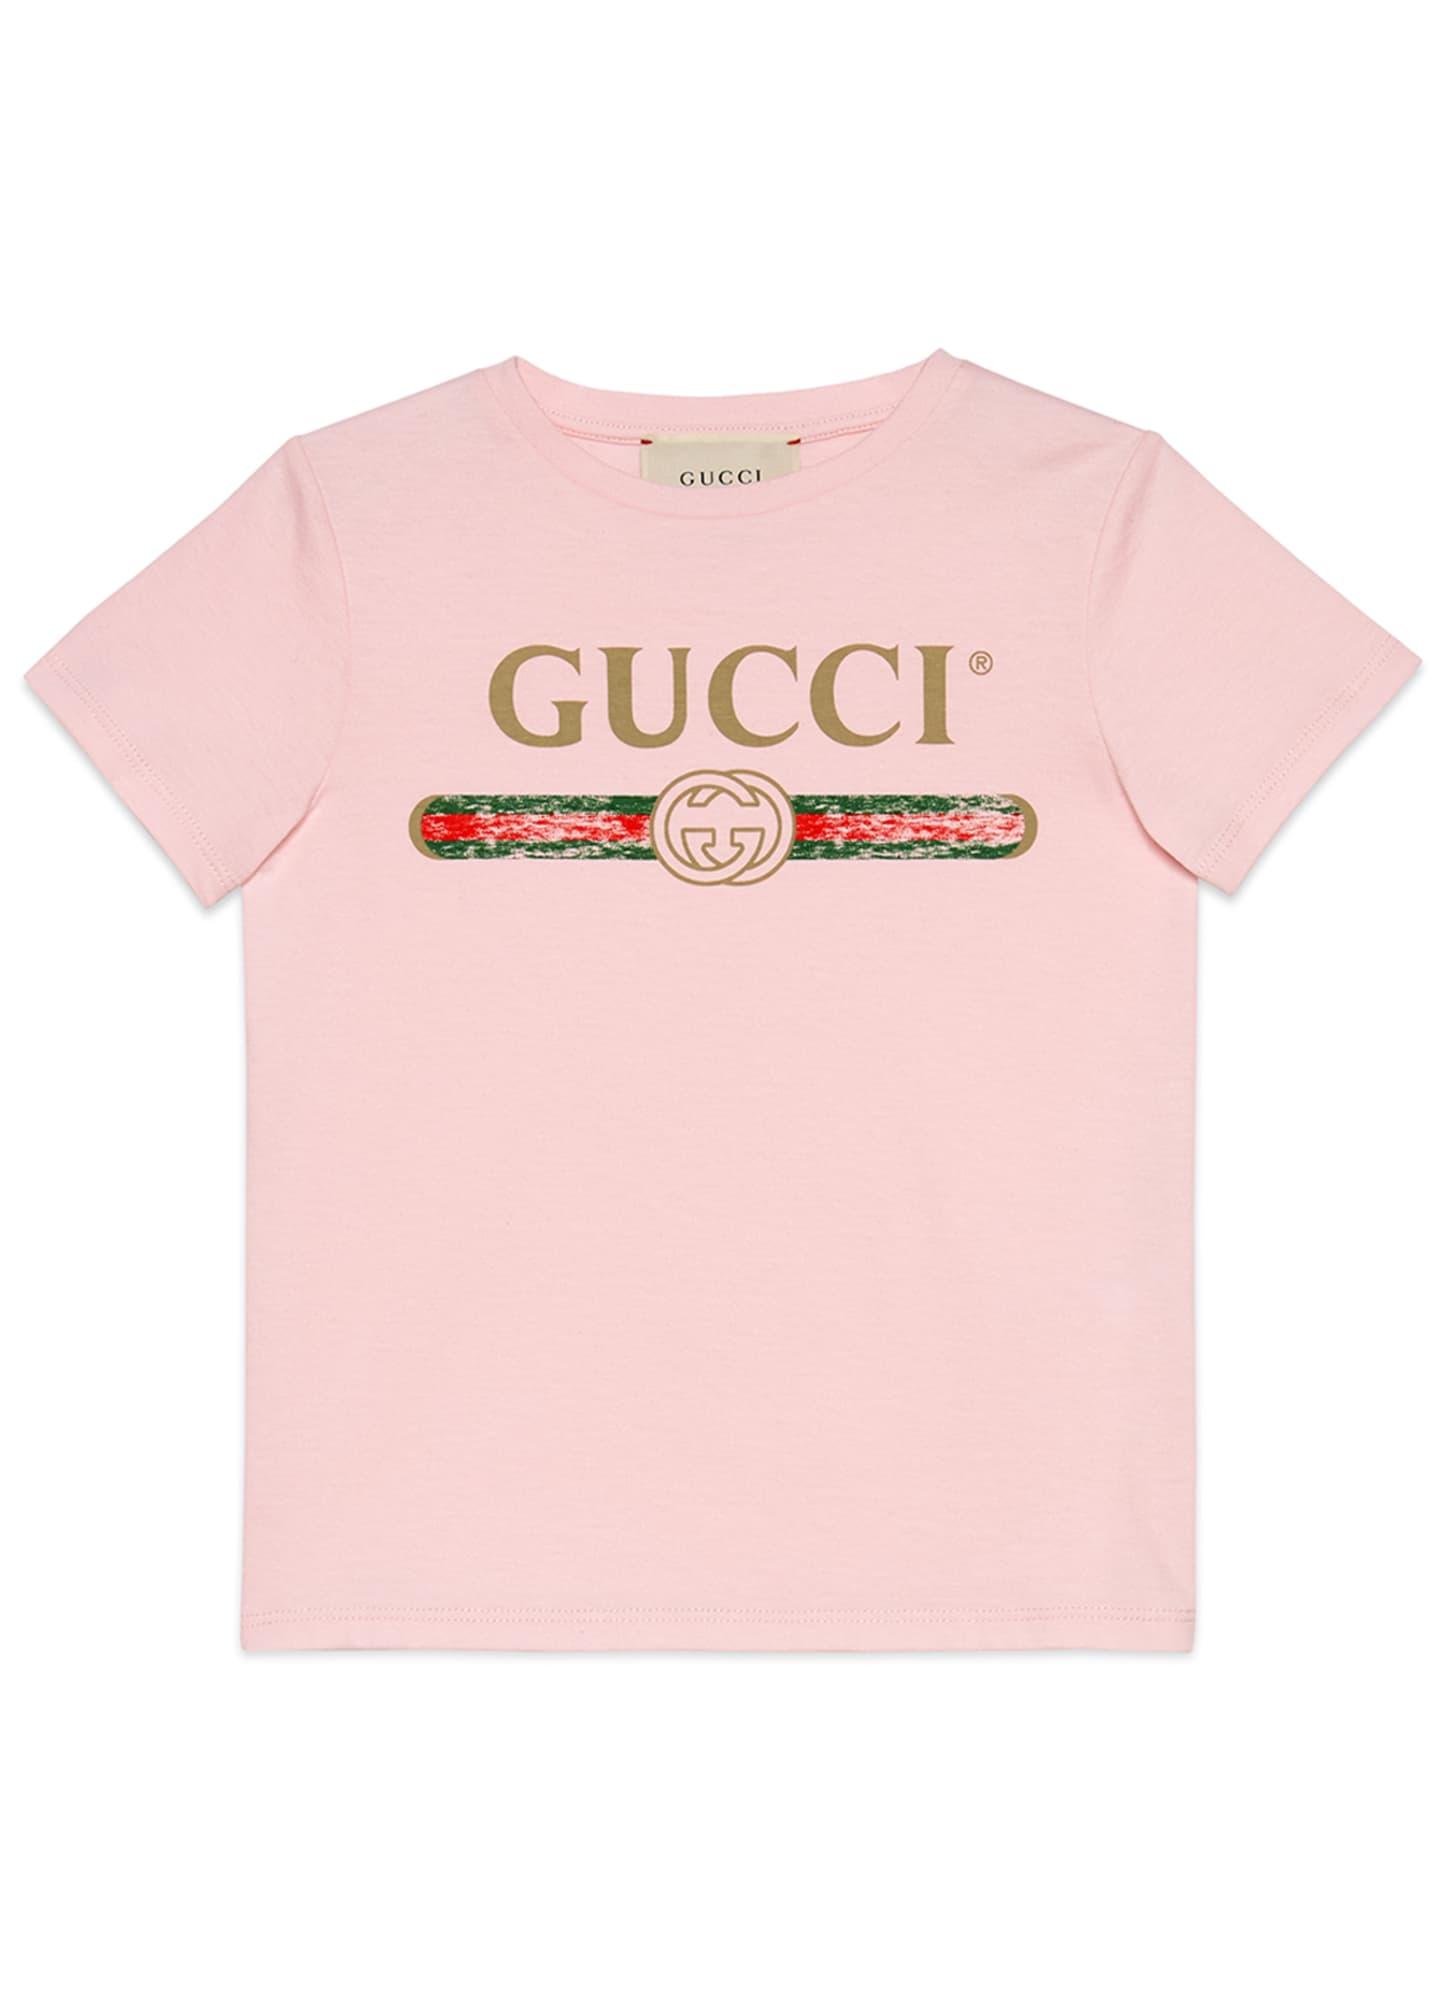 Gucci Girl's Vintage Logo Short-Sleeve Jersey T-Shirt, Size